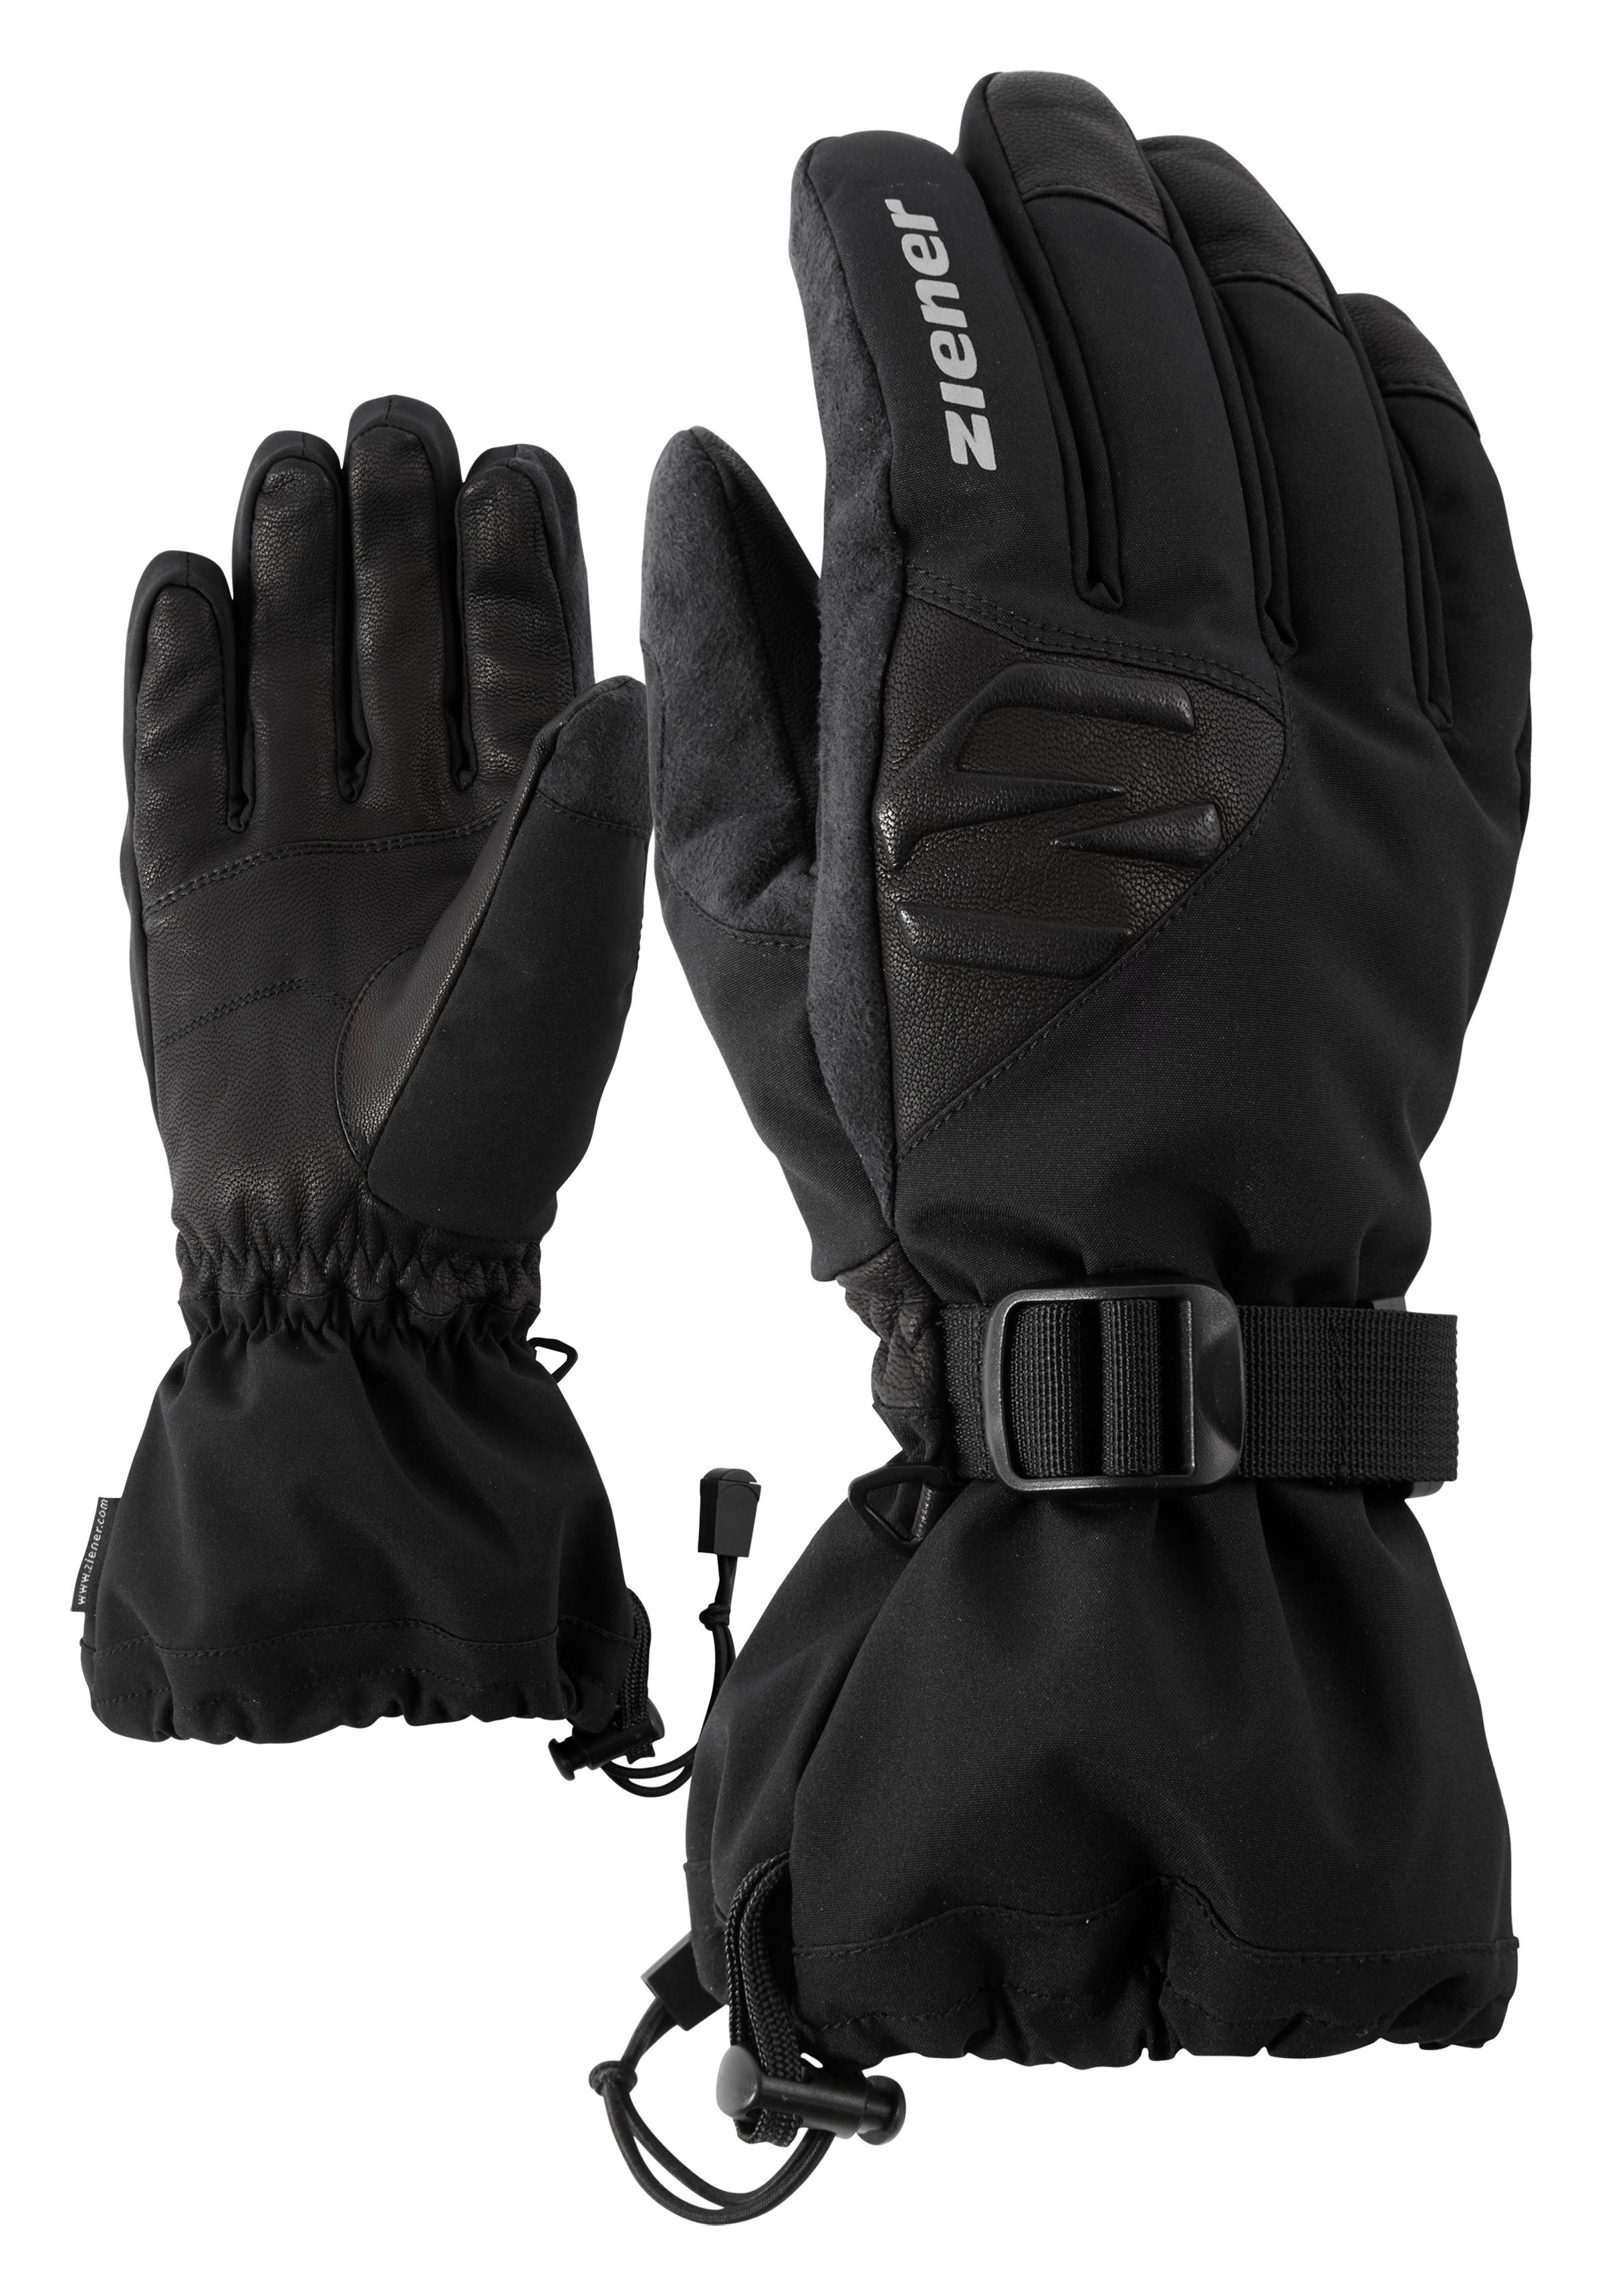 rAw Ski Alpine Ziener Gofried As Glove Black 2H9IDWE